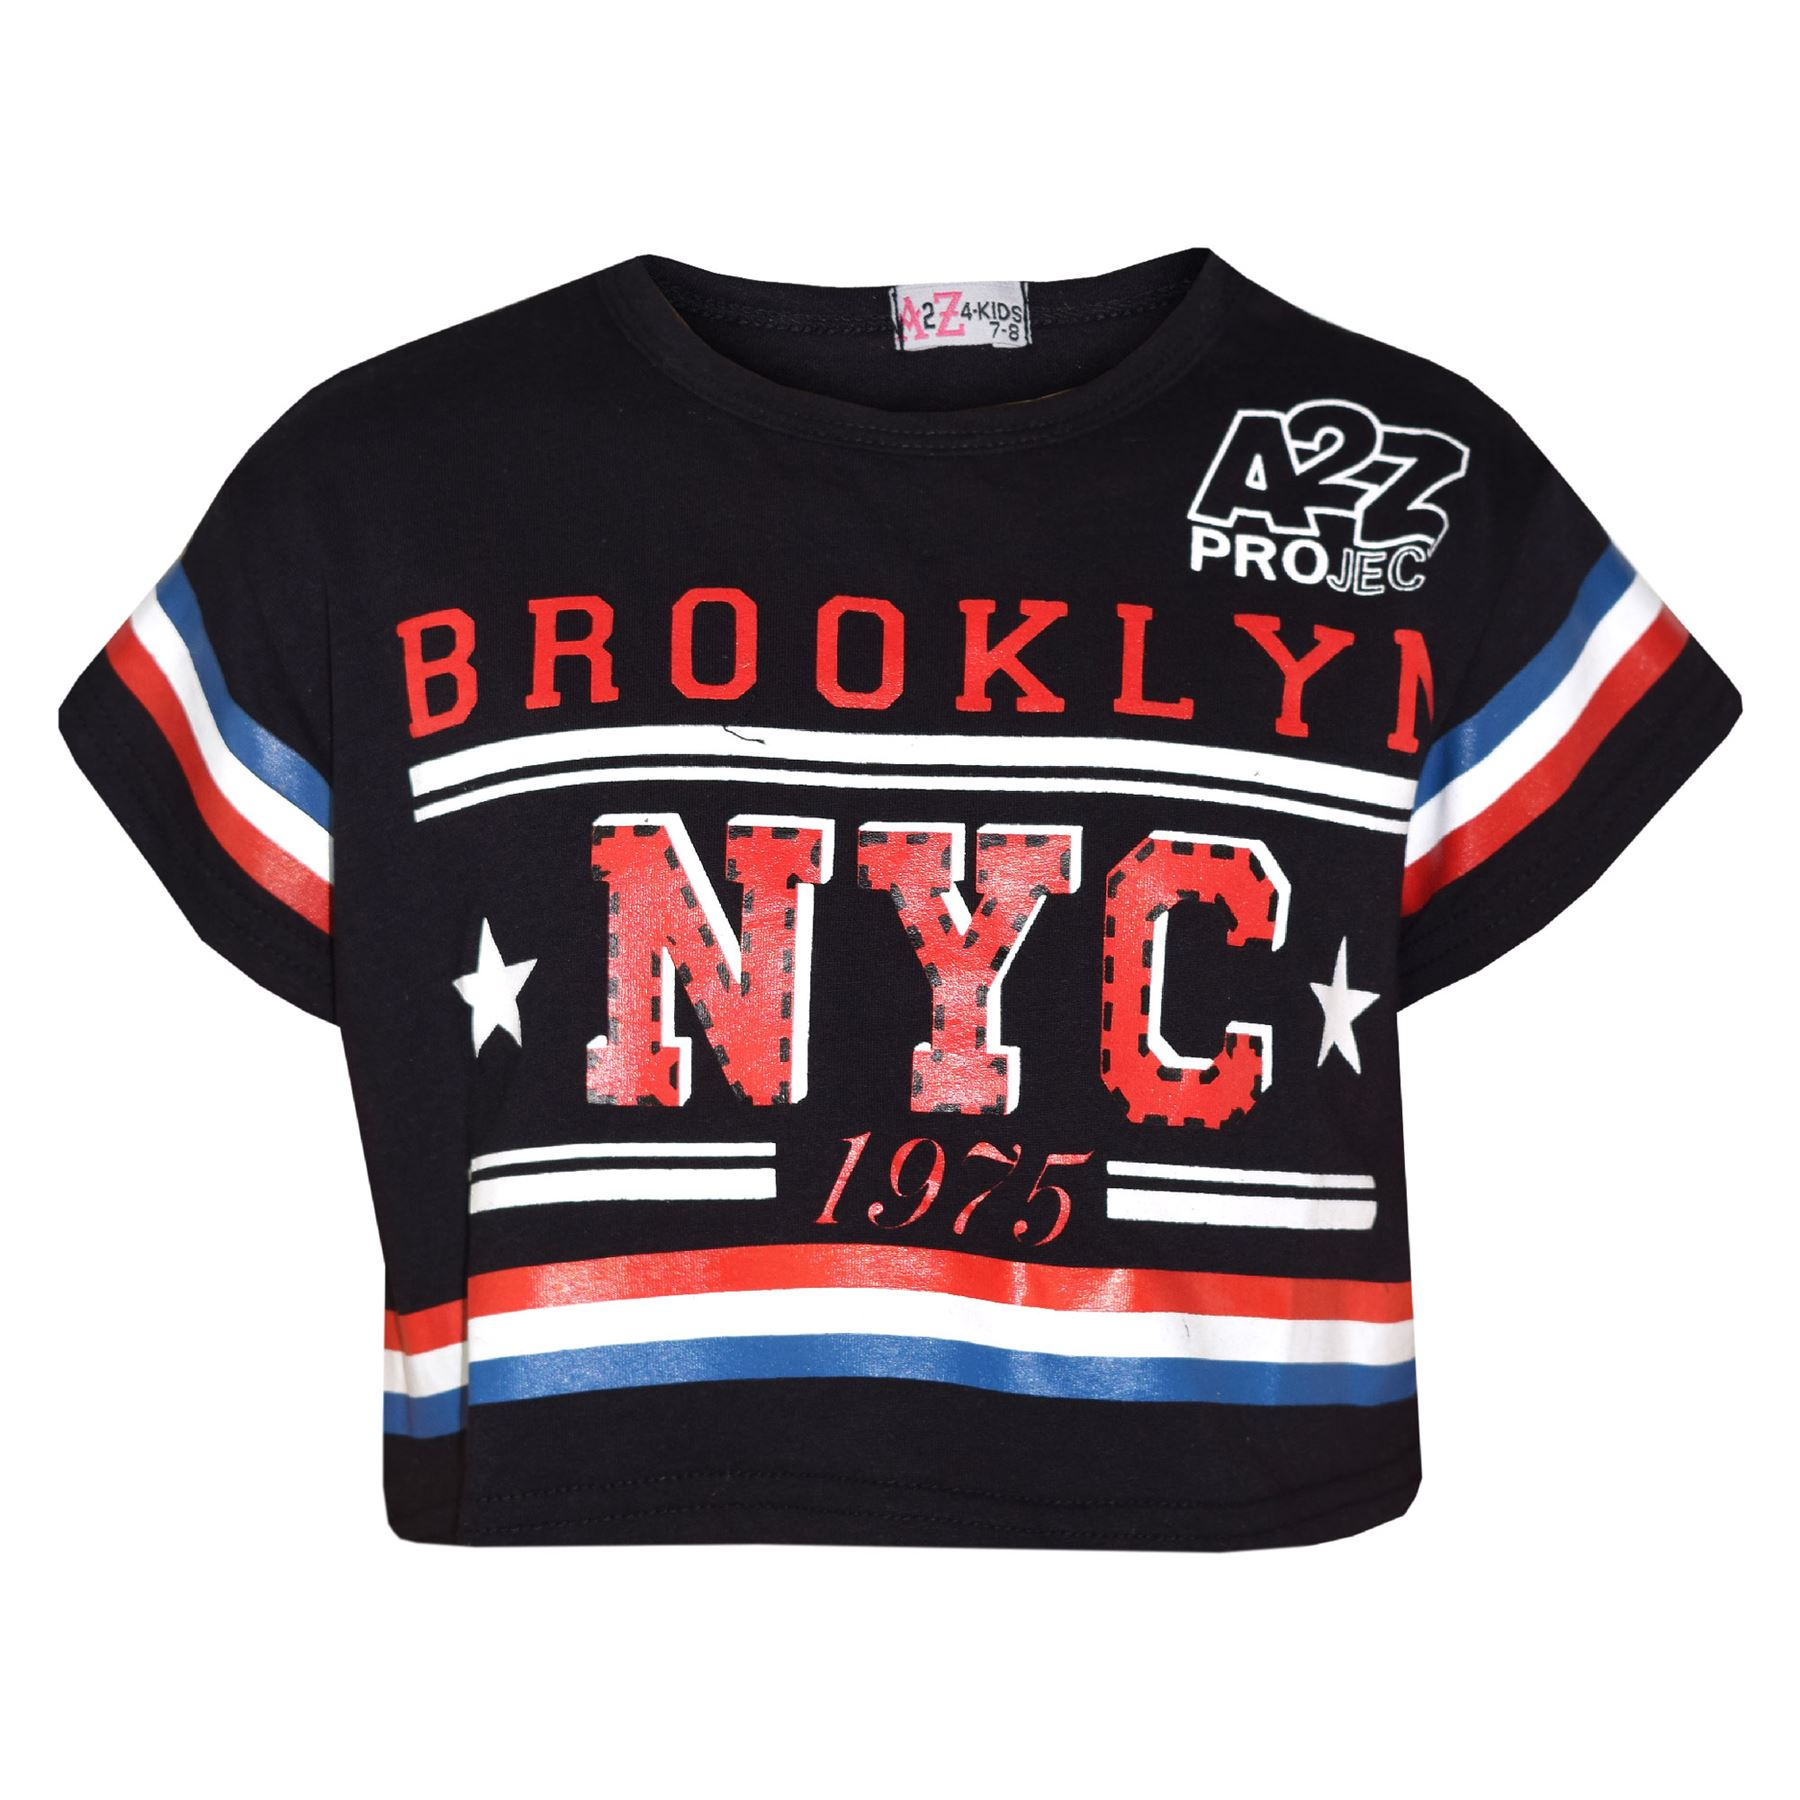 Kids Girls Tops Brooklyn NYC 1975 Stylish Crop Top Legging Lounge Wear Set 5-13Y